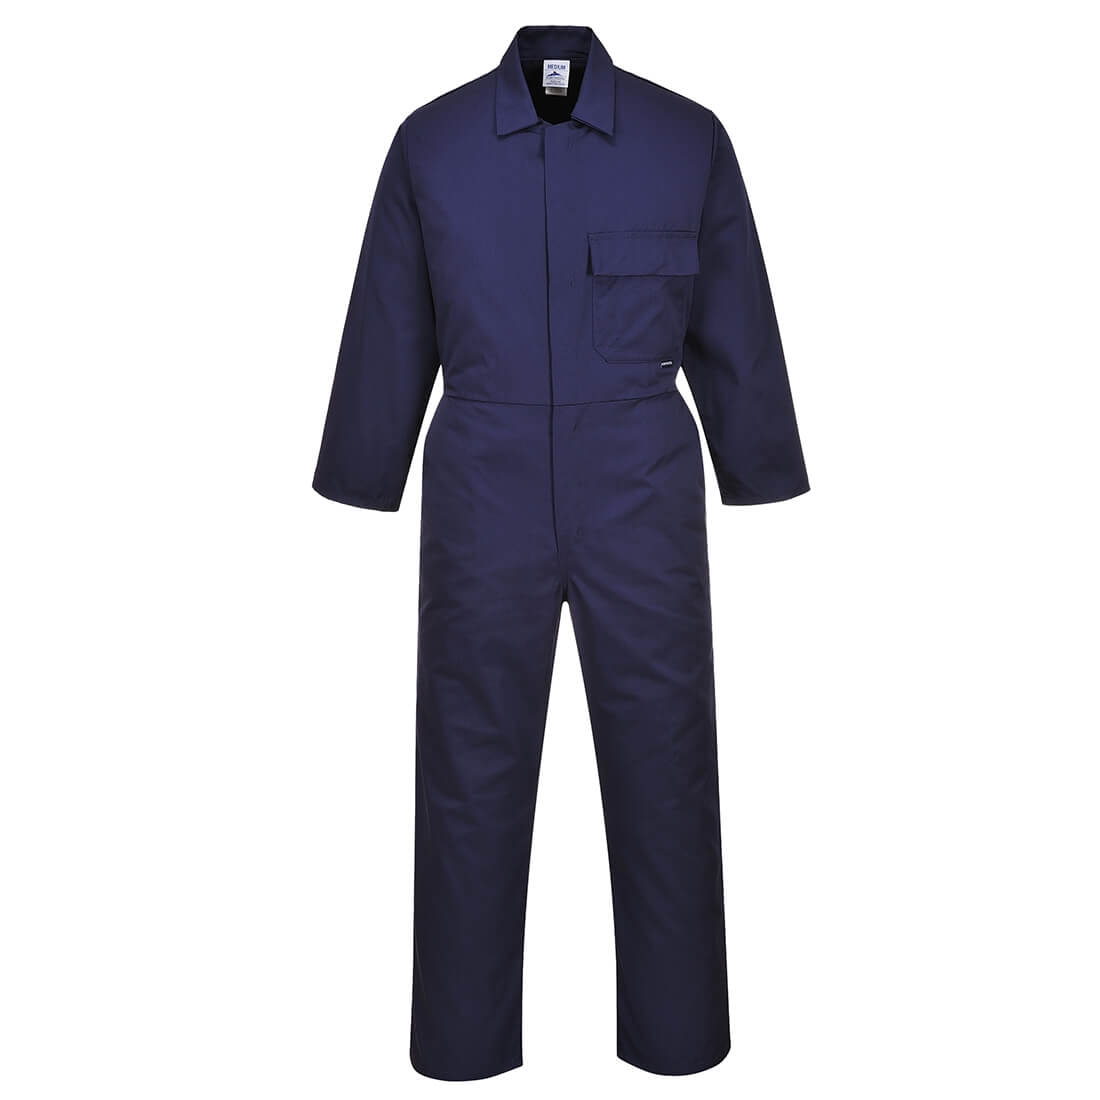 Combinezon Standard - Imbracaminte de protectie